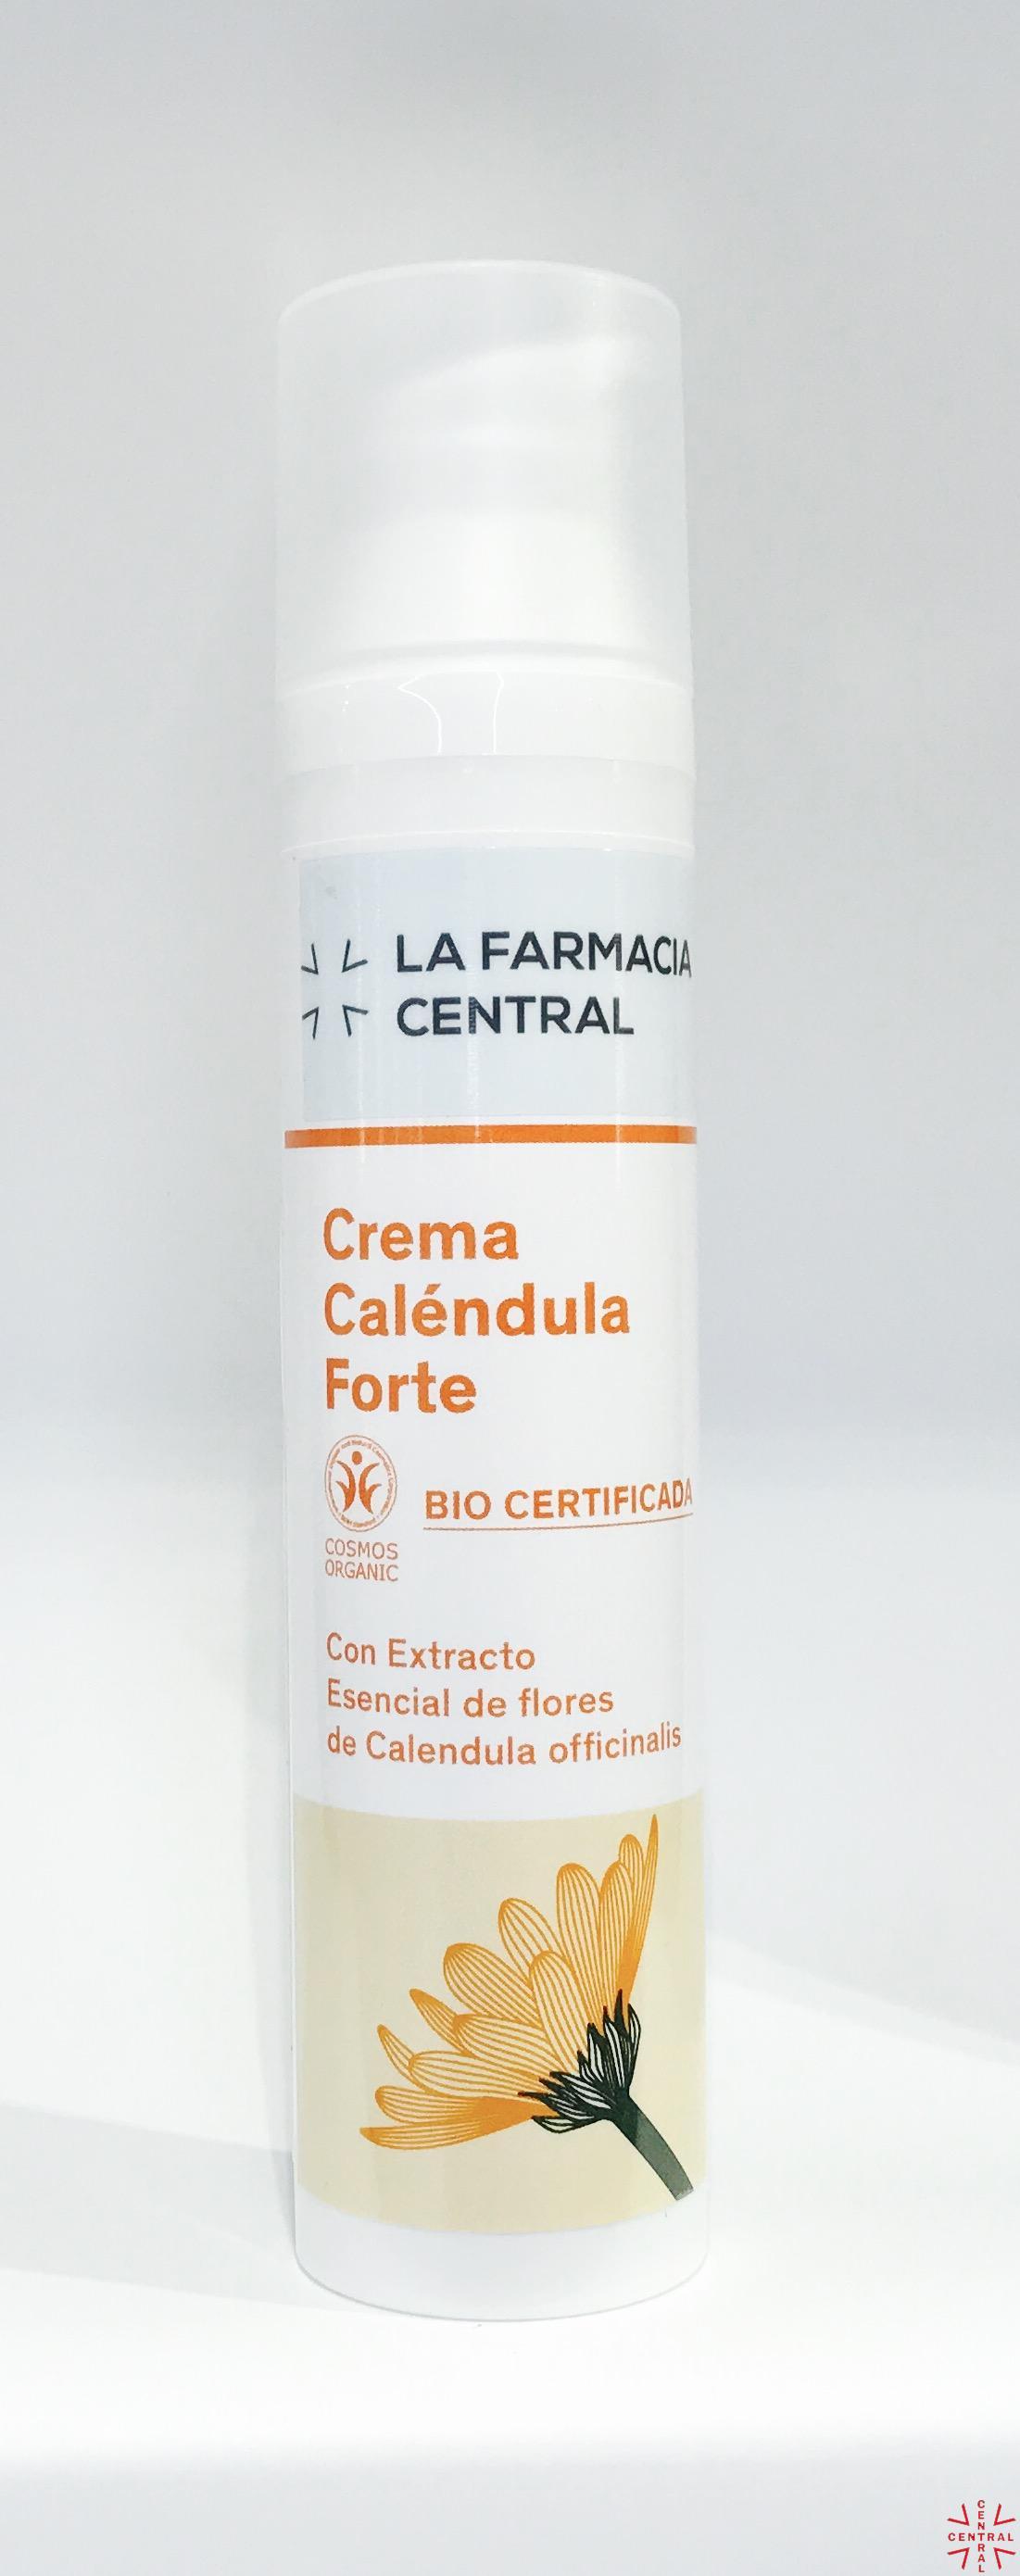 LFC Crema Caléndula forte 100ml Bio Certificada